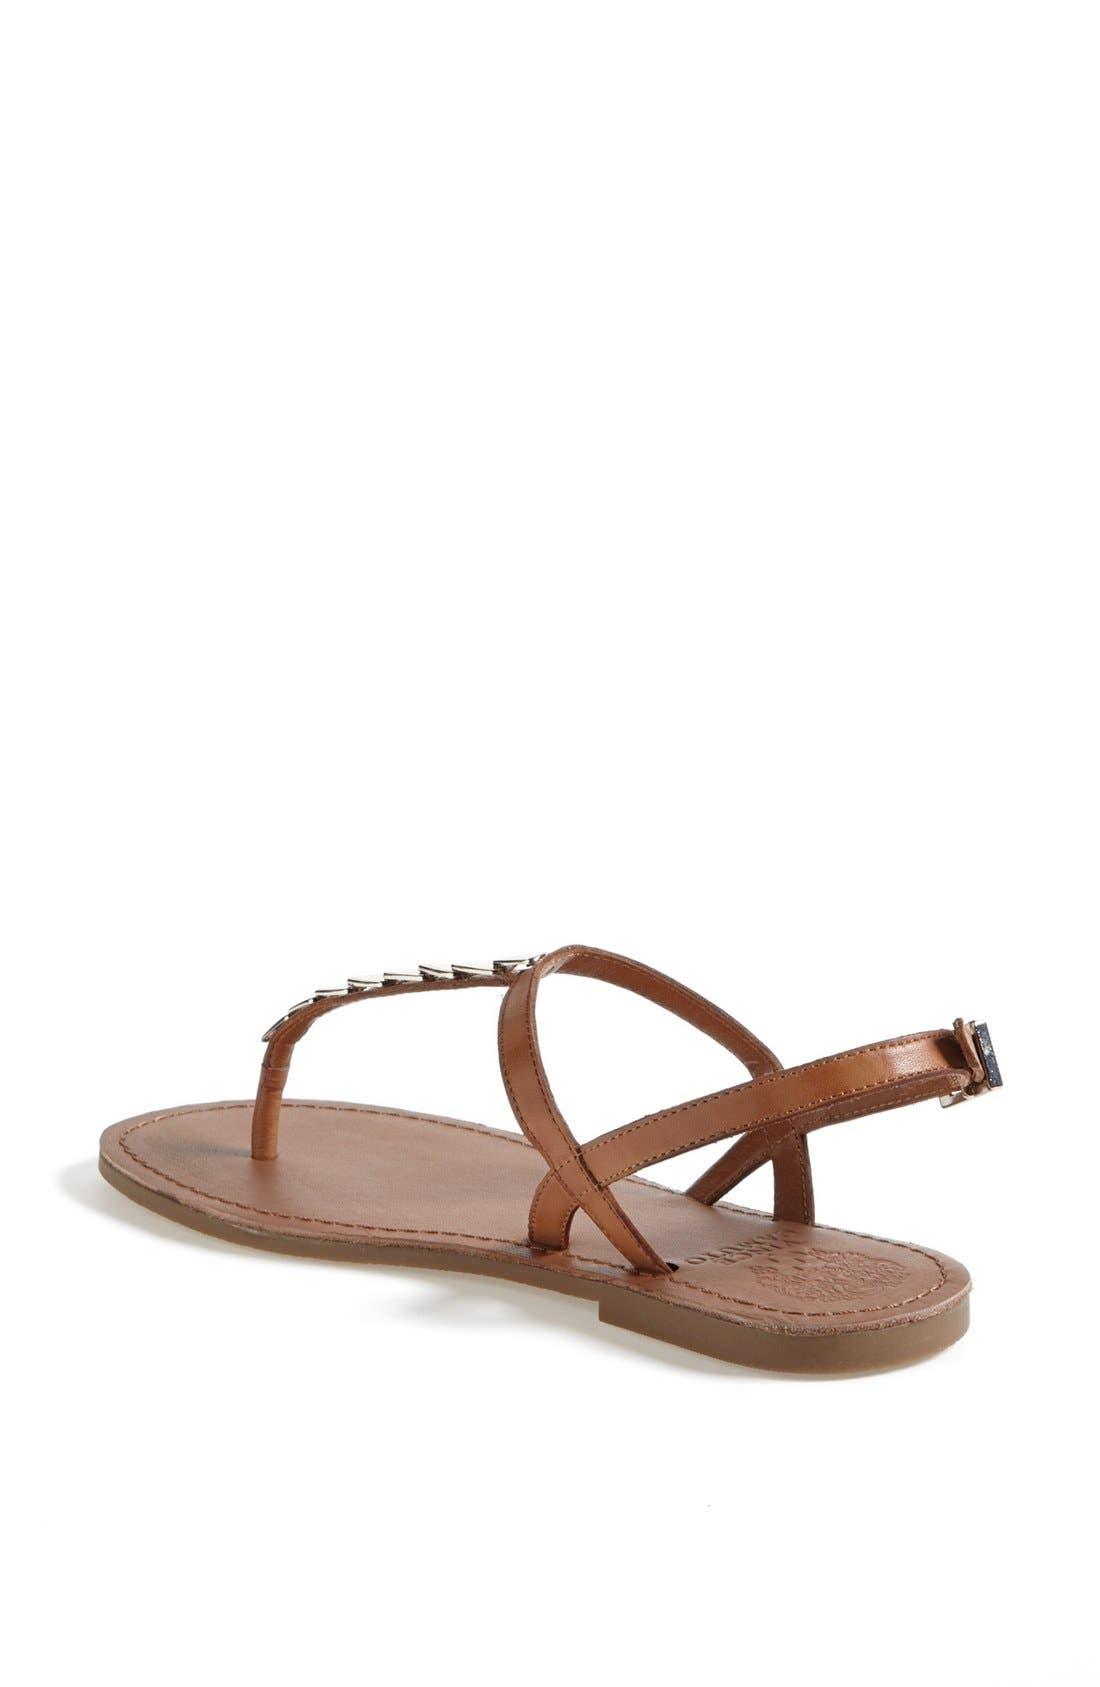 Alternate Image 2  - Vince Camuto 'Illison' Sandal